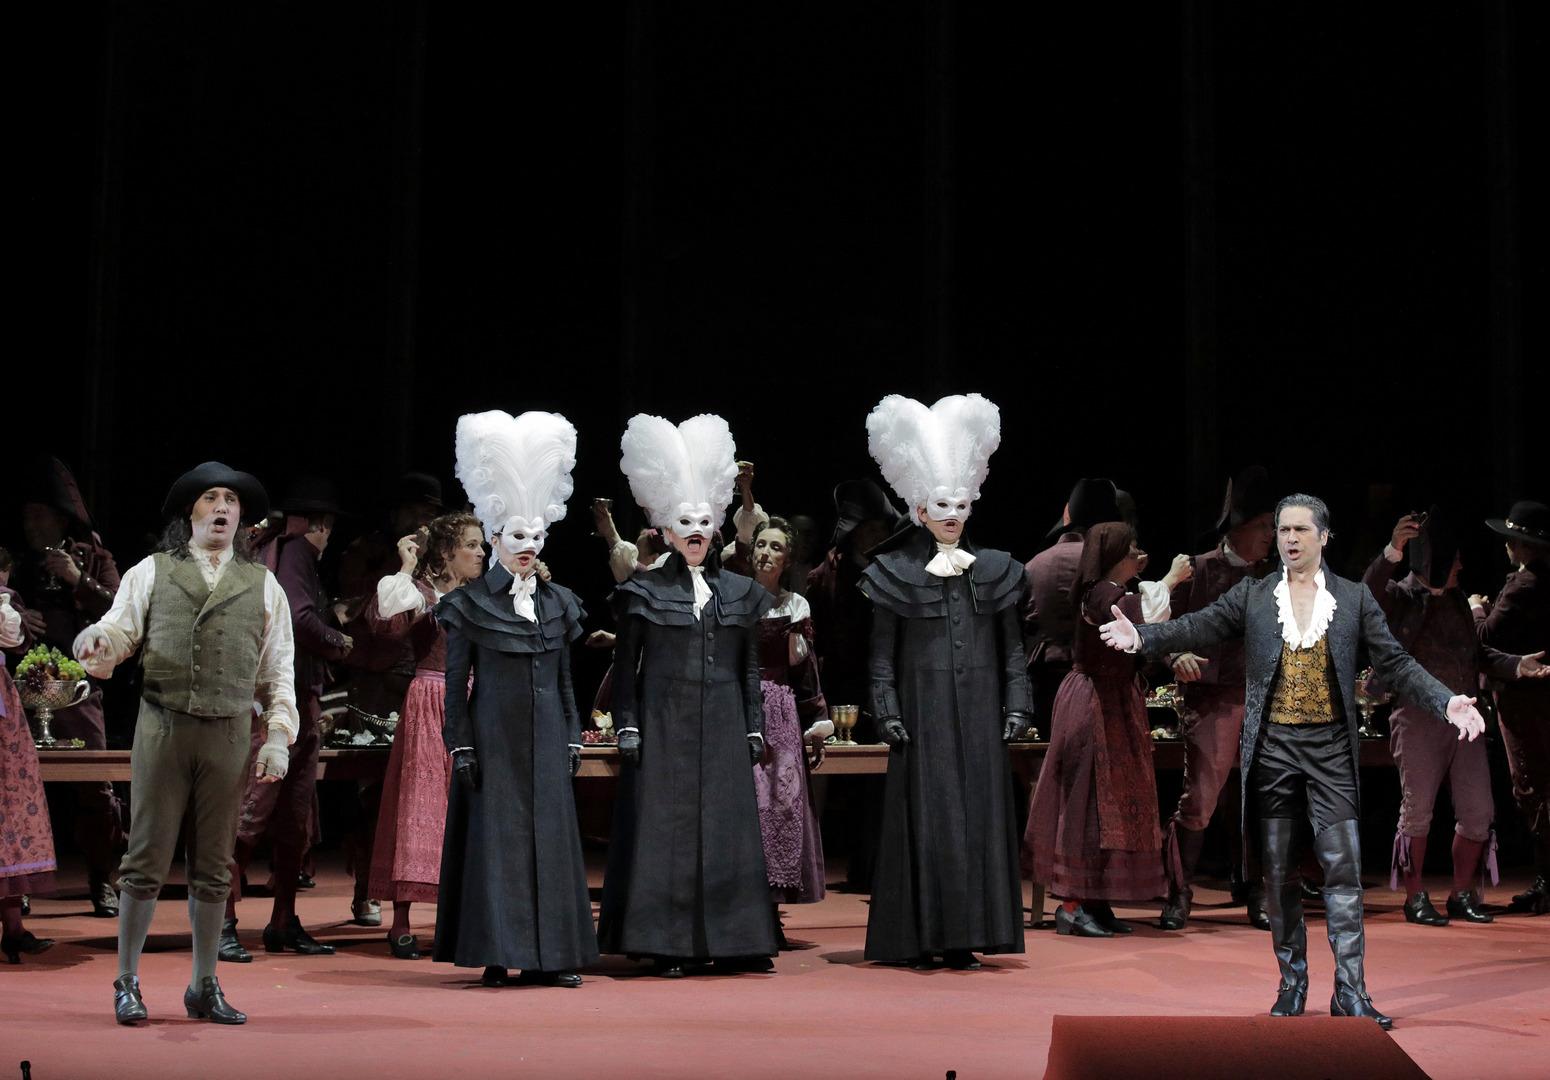 Opera-Director-Jacopo-Spirei-Don-Giovanni-Opera-by-Mozart-San-Francisco-2017-9